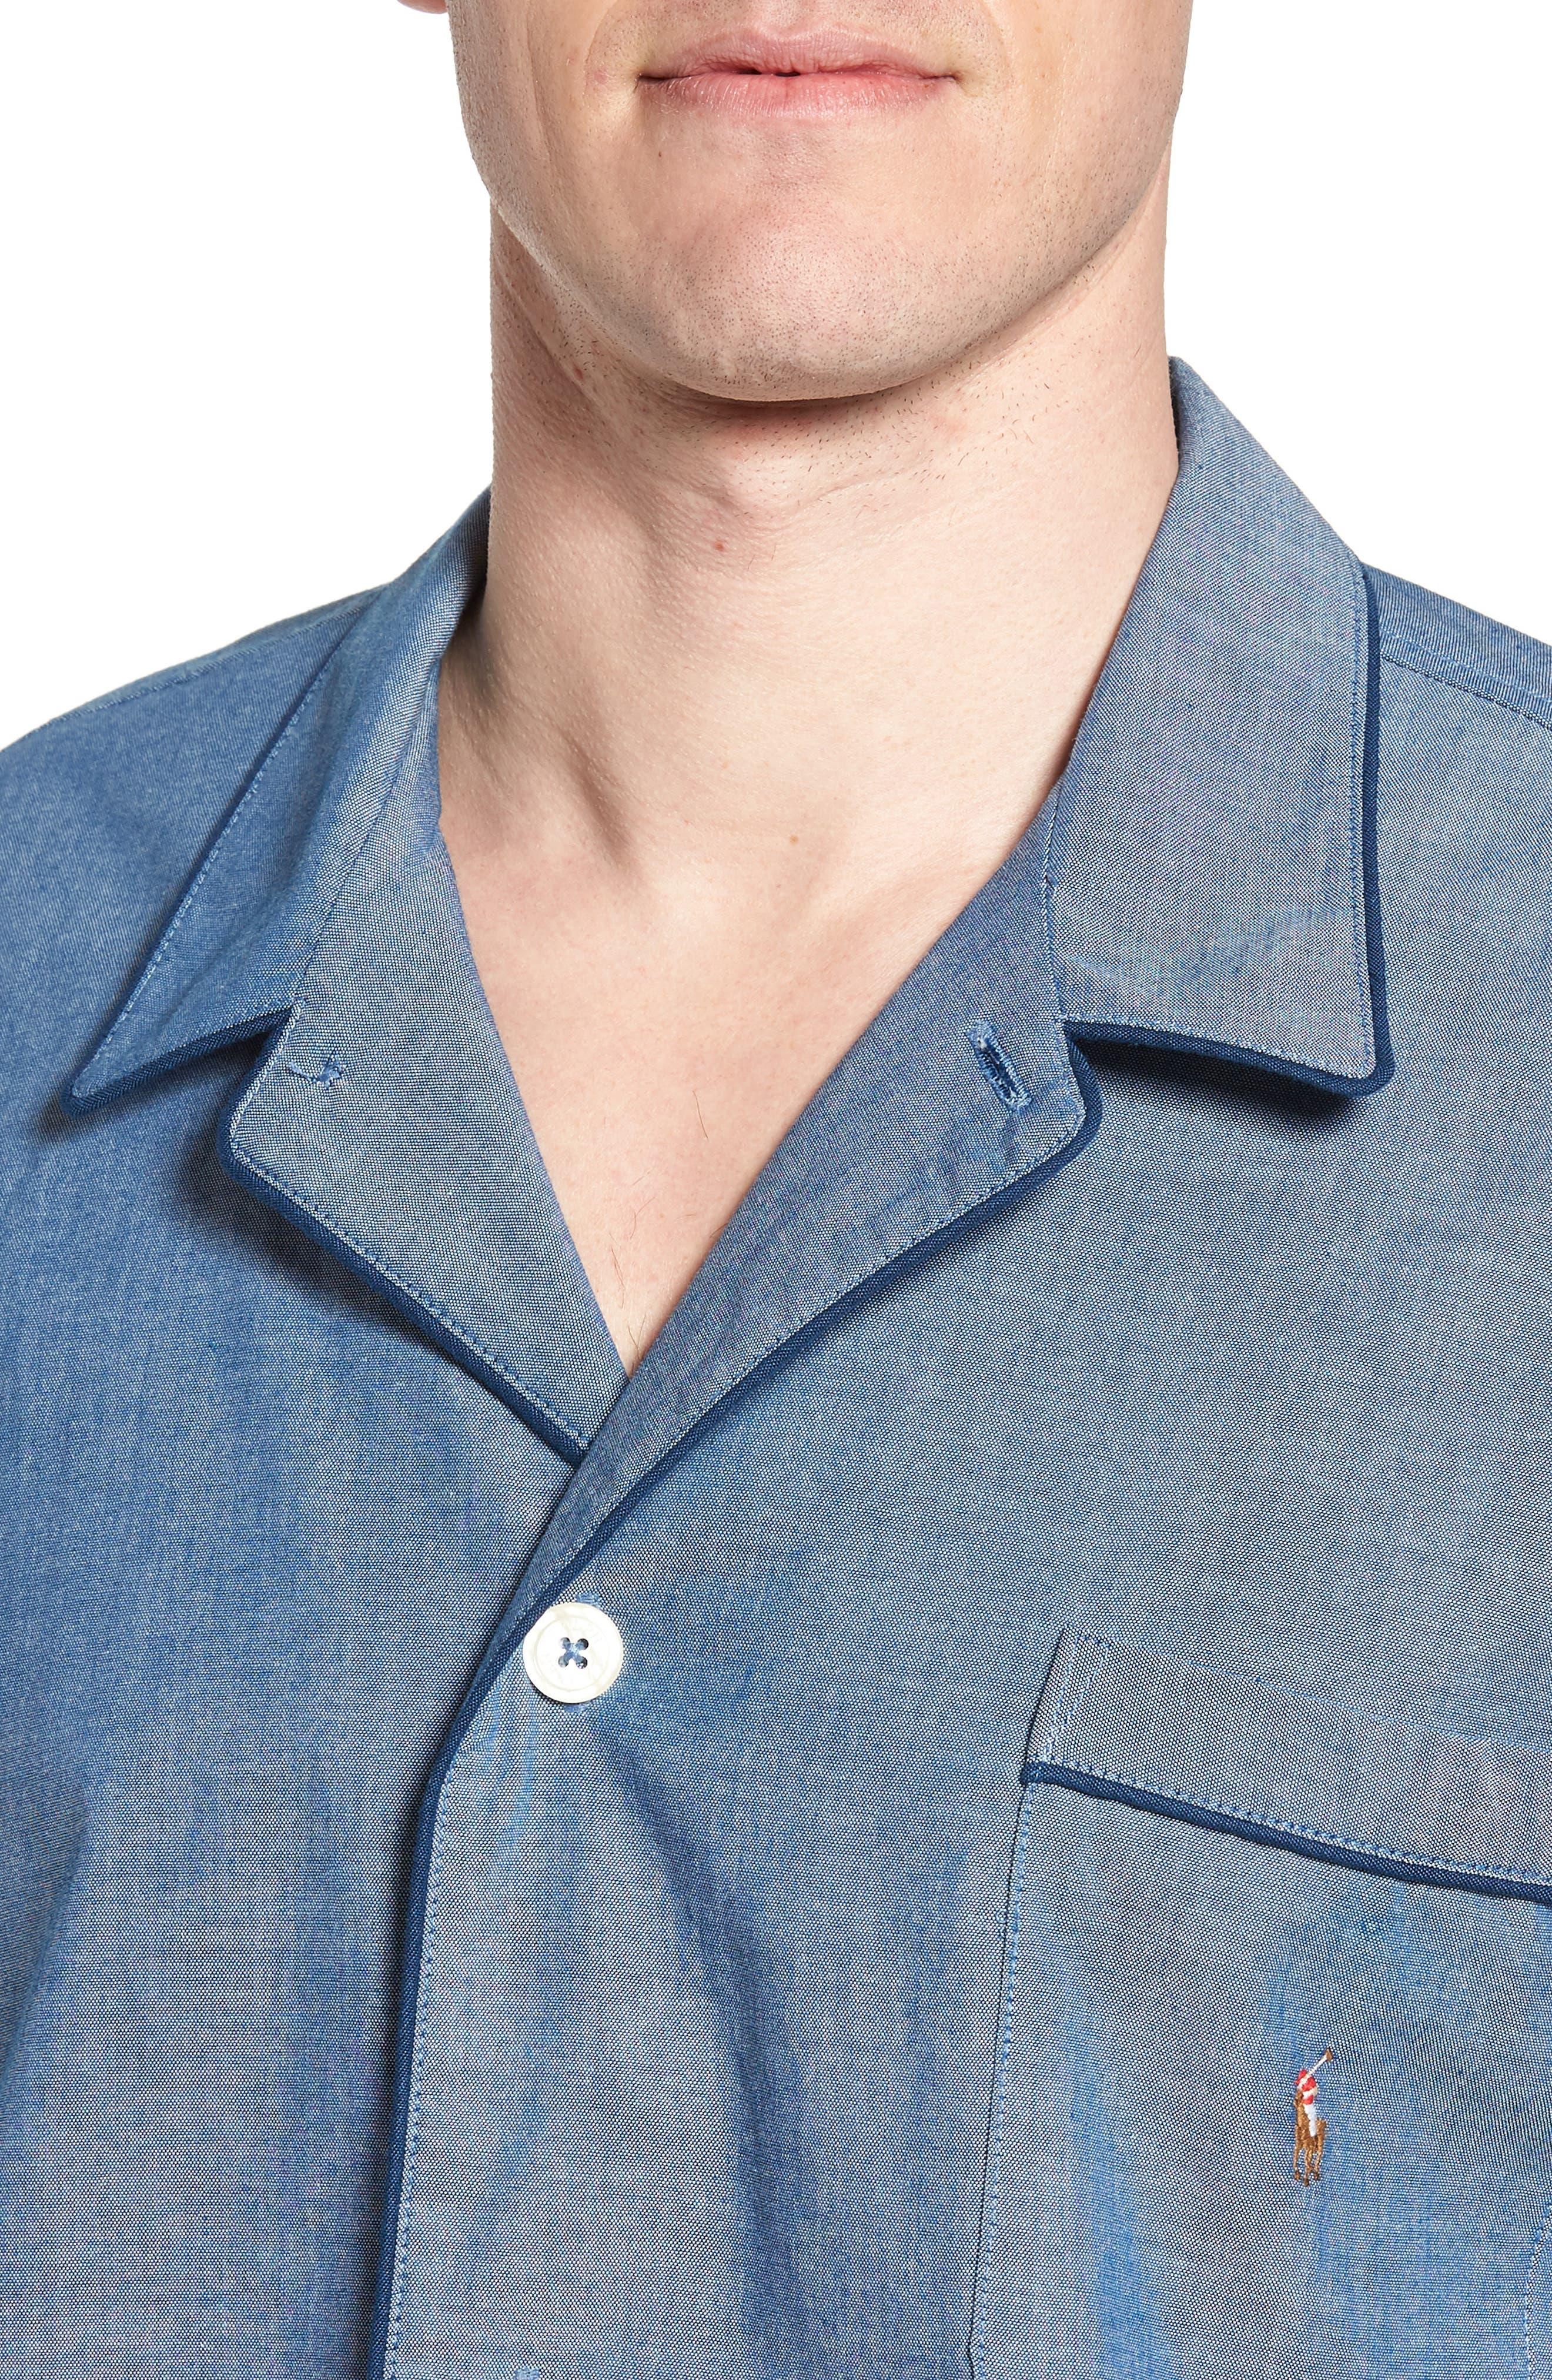 Cotton Pajama Shirt,                             Alternate thumbnail 4, color,                             Medium Indigo/ Dark Indigo